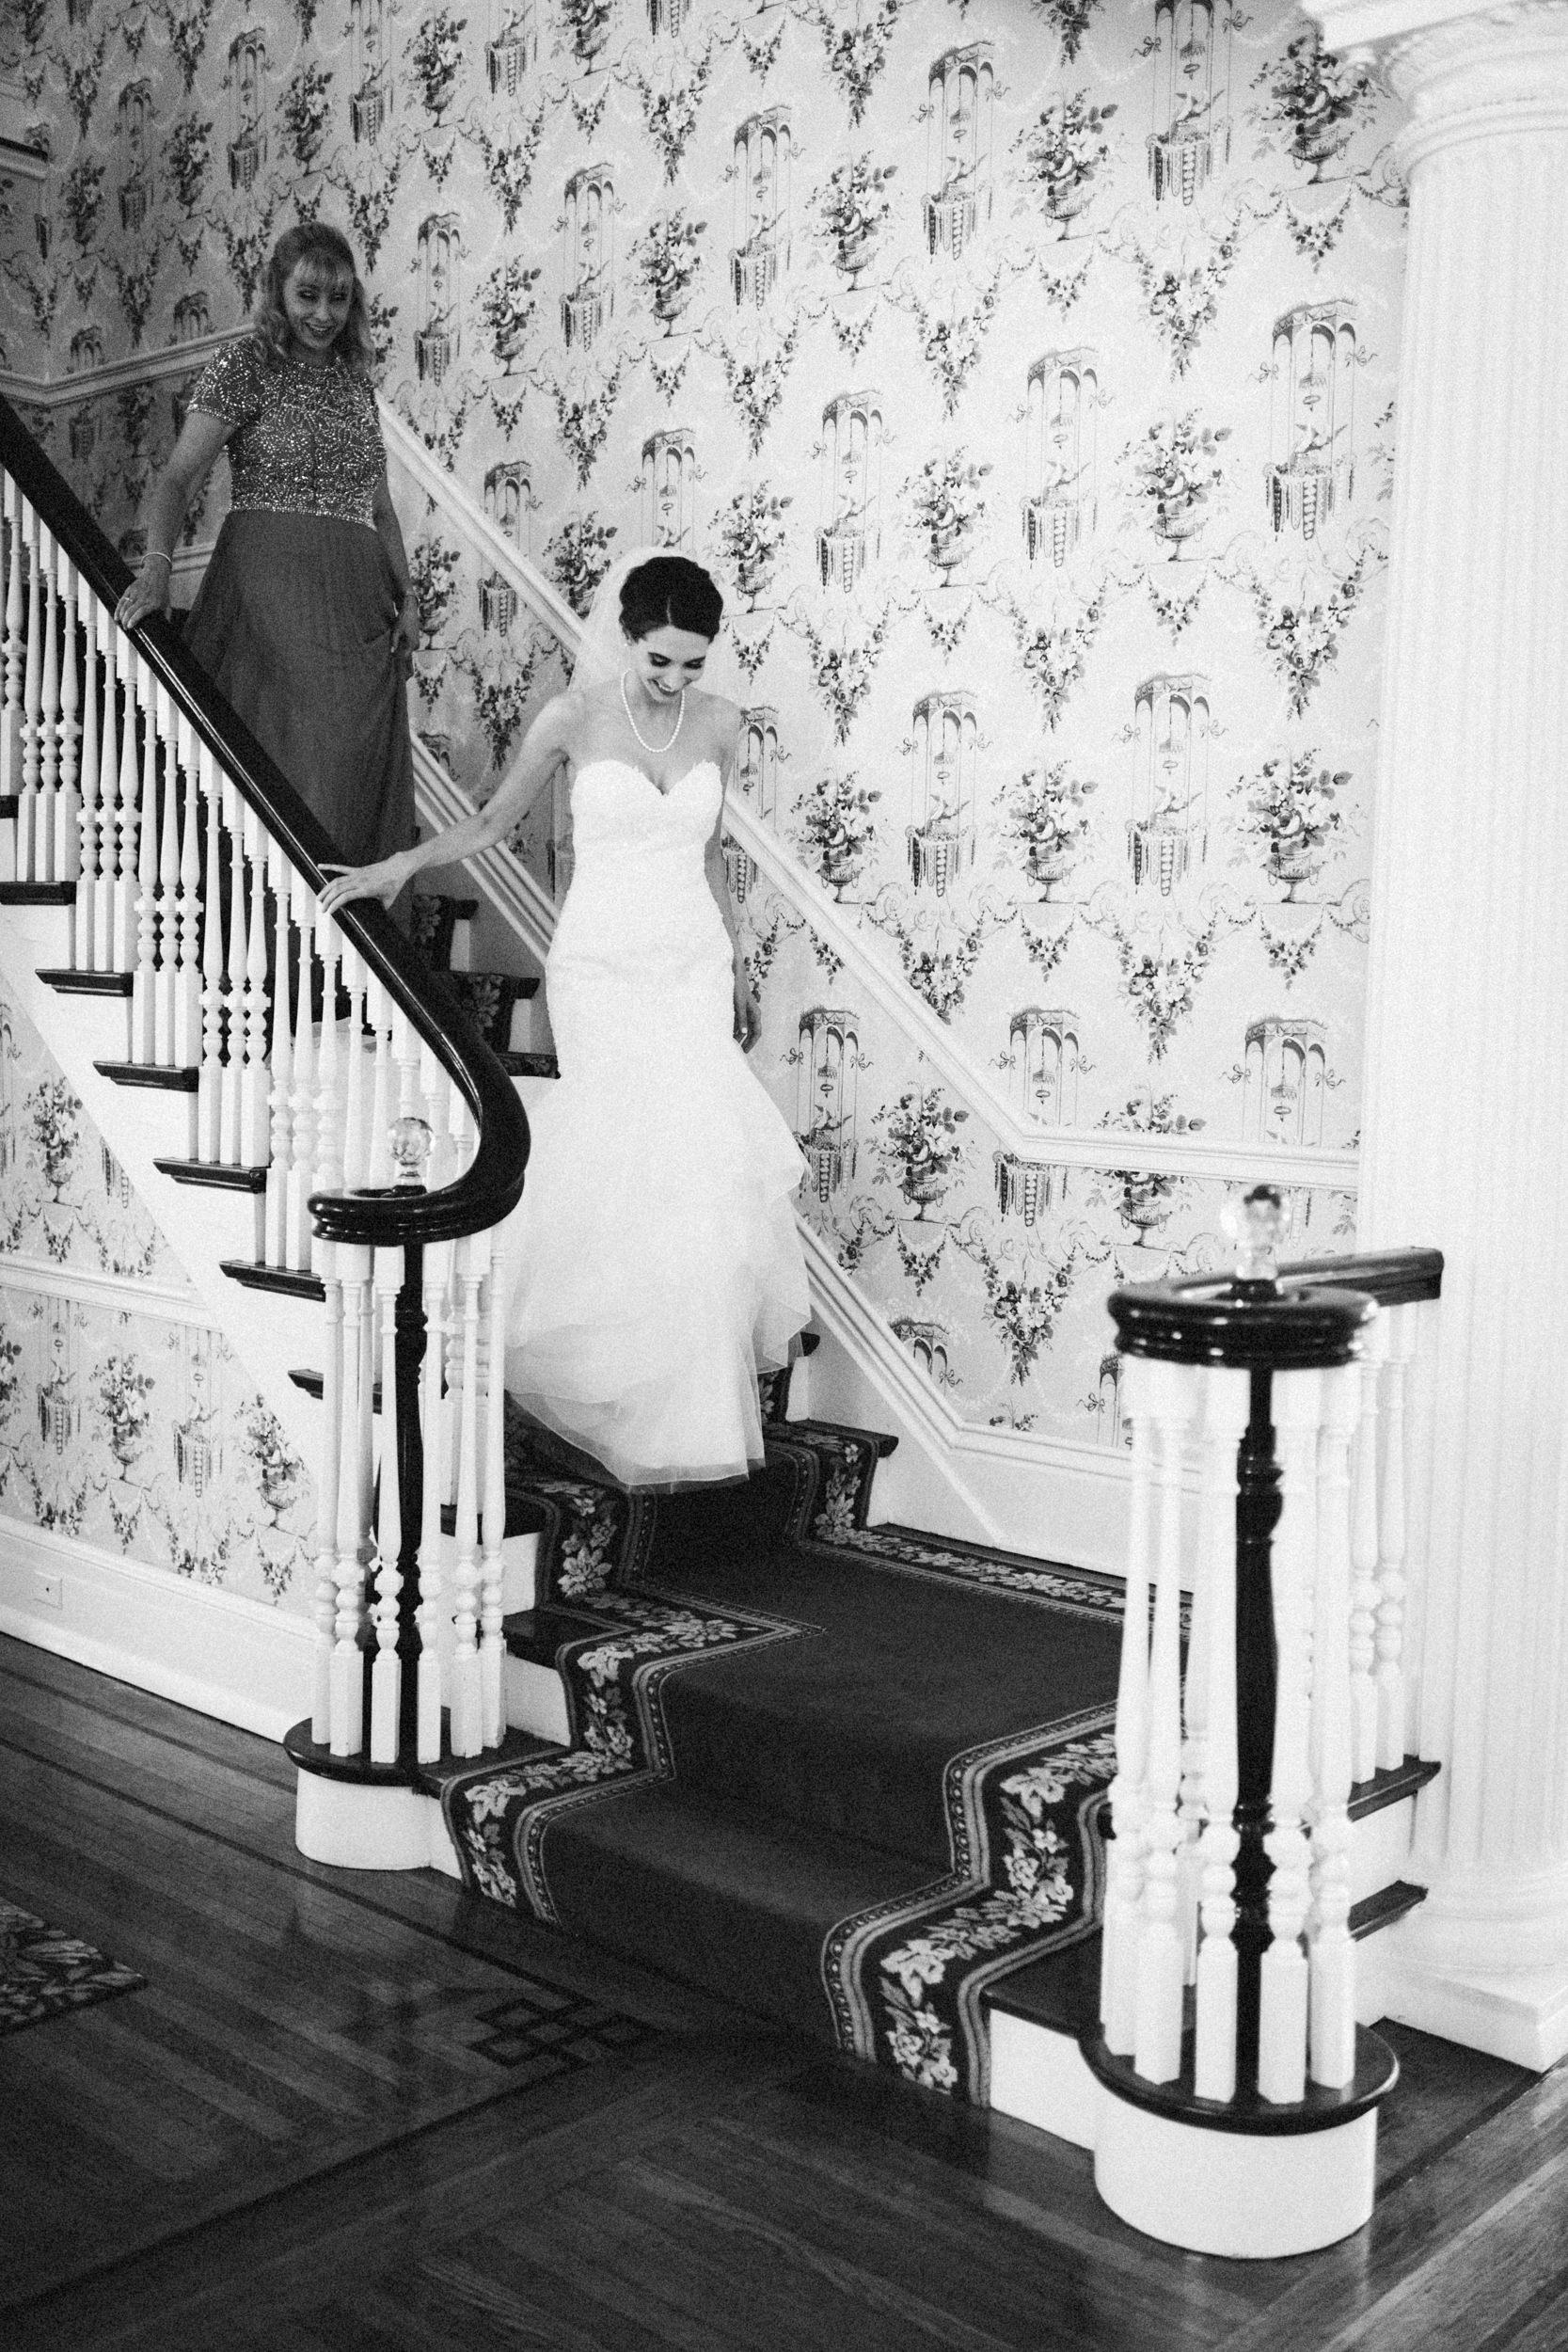 Louisville-Kentucky-Wedding-Elopement-Photographer-Sarah-Katherine-Davis-Photography-Whitehall-Classic-Timeless-Garden-Wedding-212.jpg